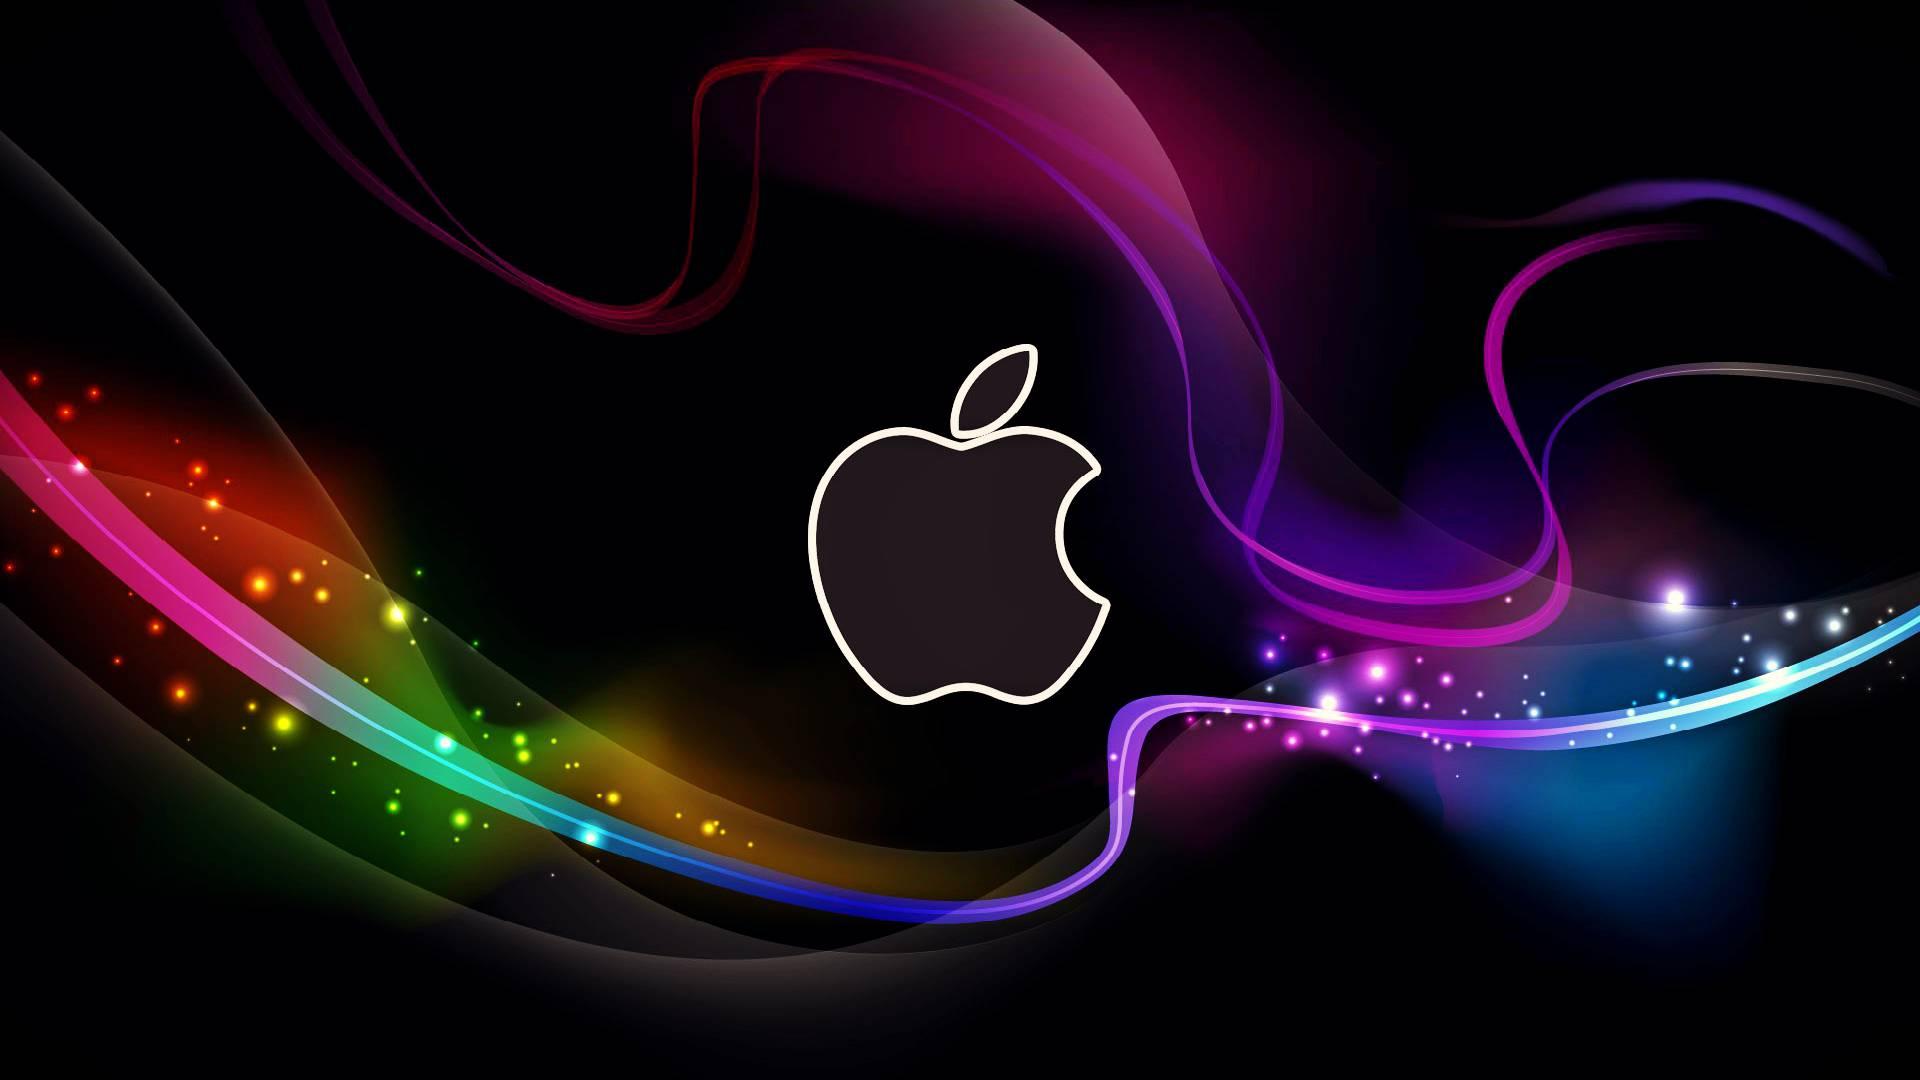 Cool Apple Logos   wallpaper 1920x1080